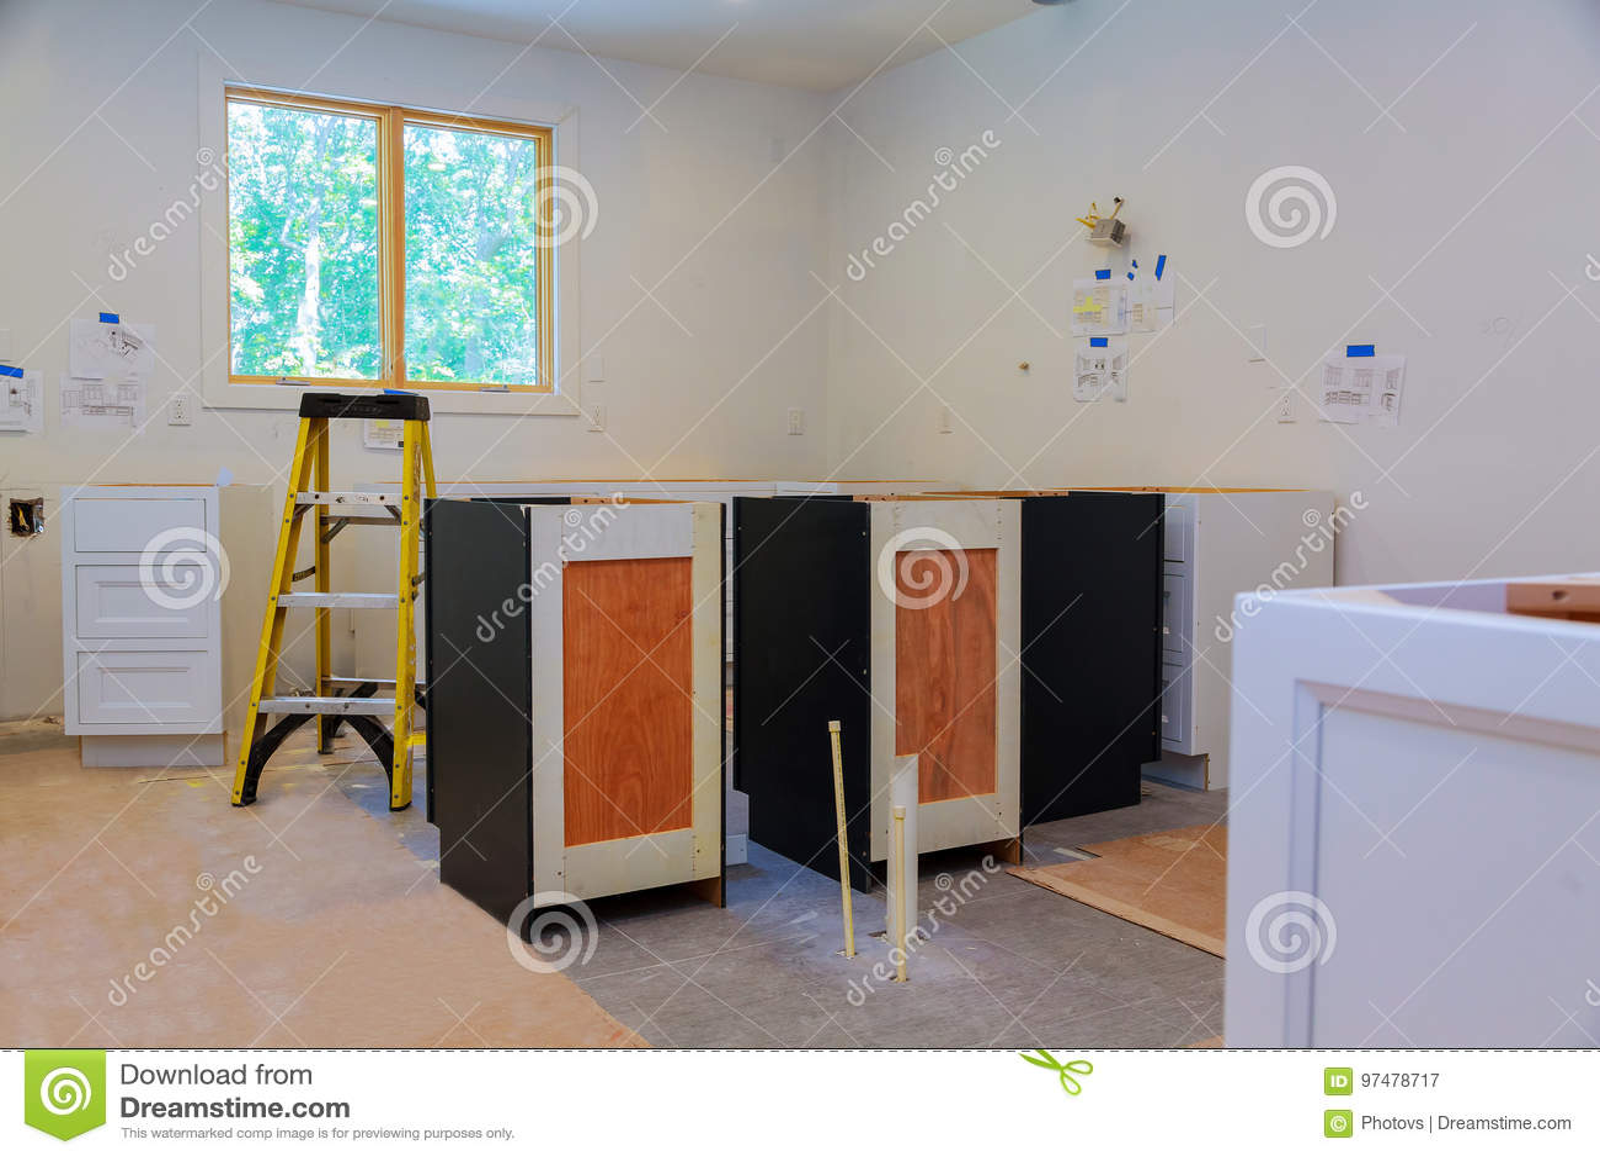 Armadi da cucina su ordinazione in varie fasi di installazione